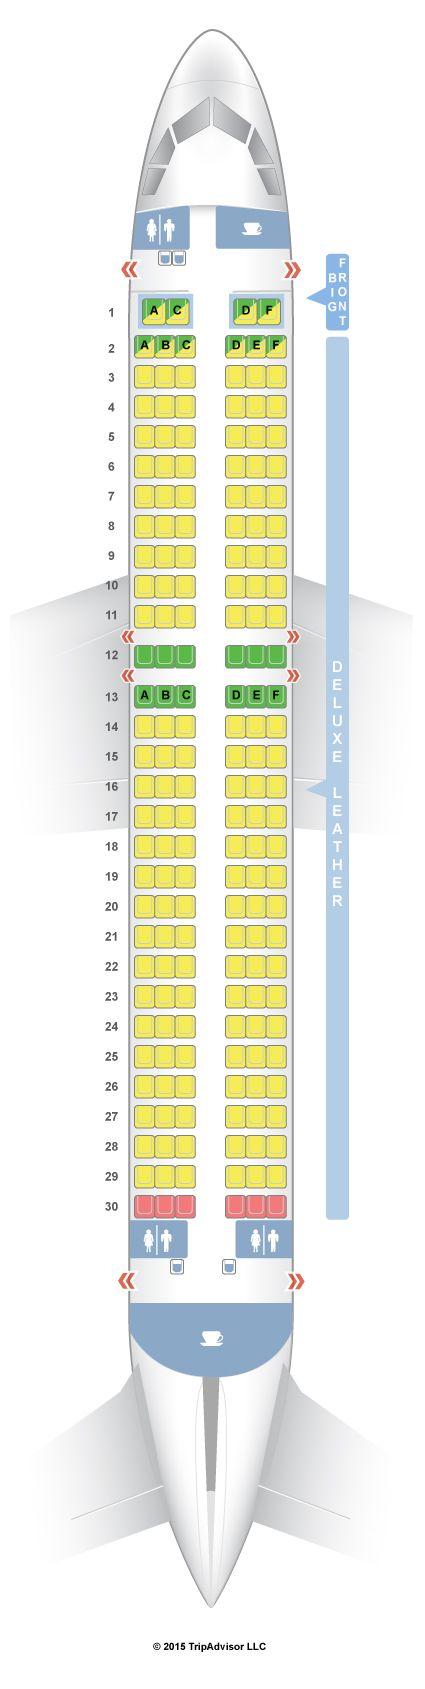 Air France Flight Information Seatguru Seat Map Spirit Airbus A320 320